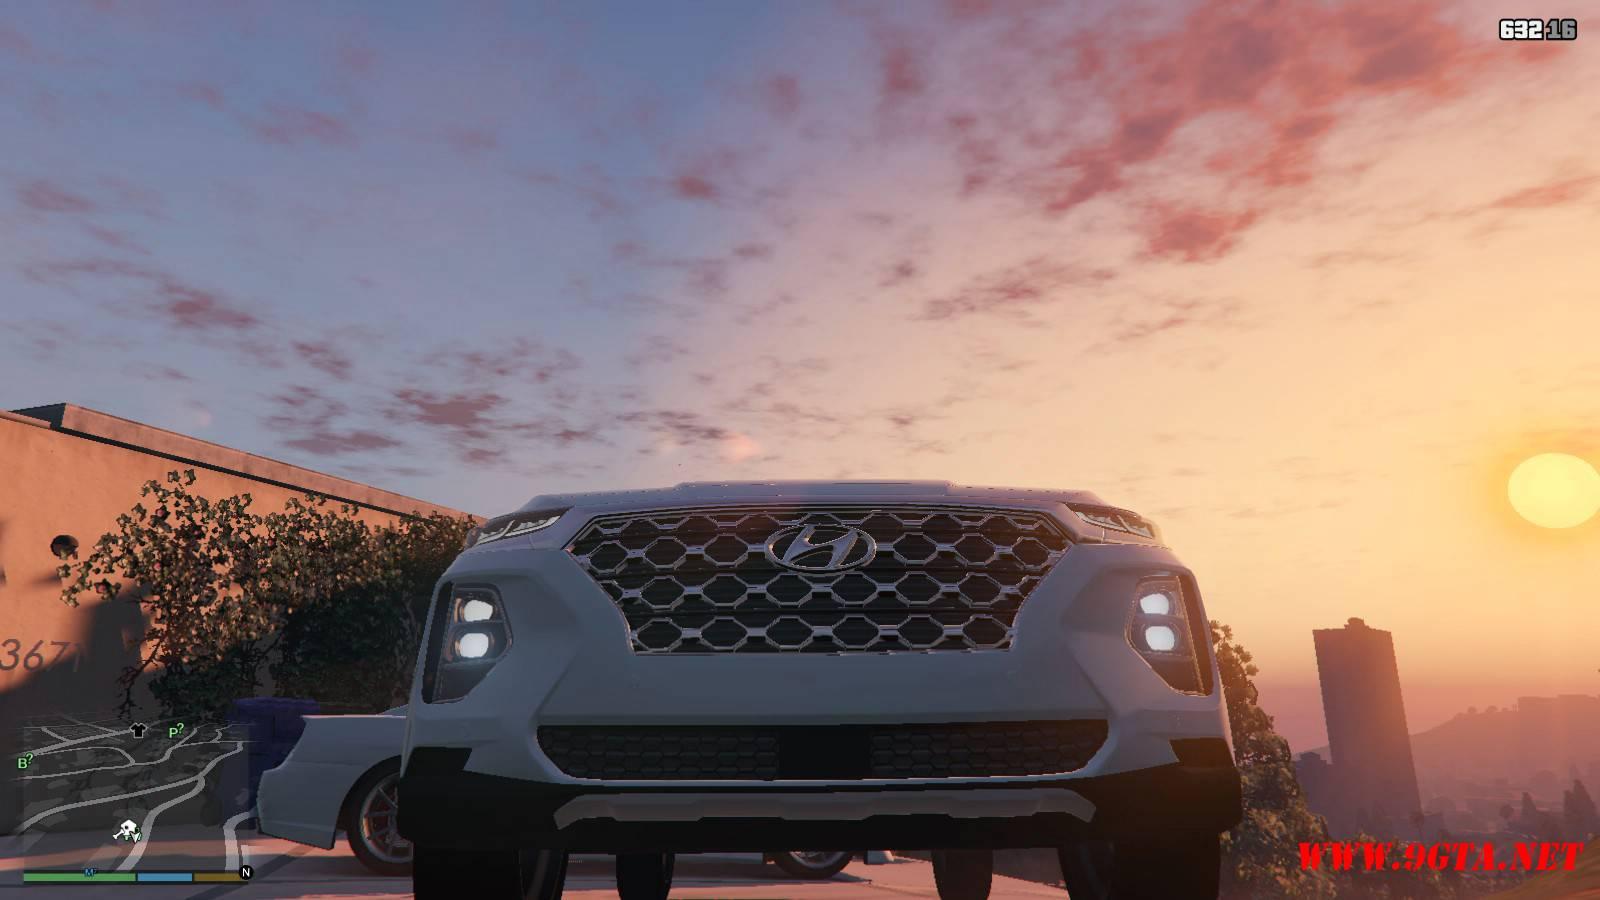 2019 Huyndai Santa Fe GTA5 mods (7)